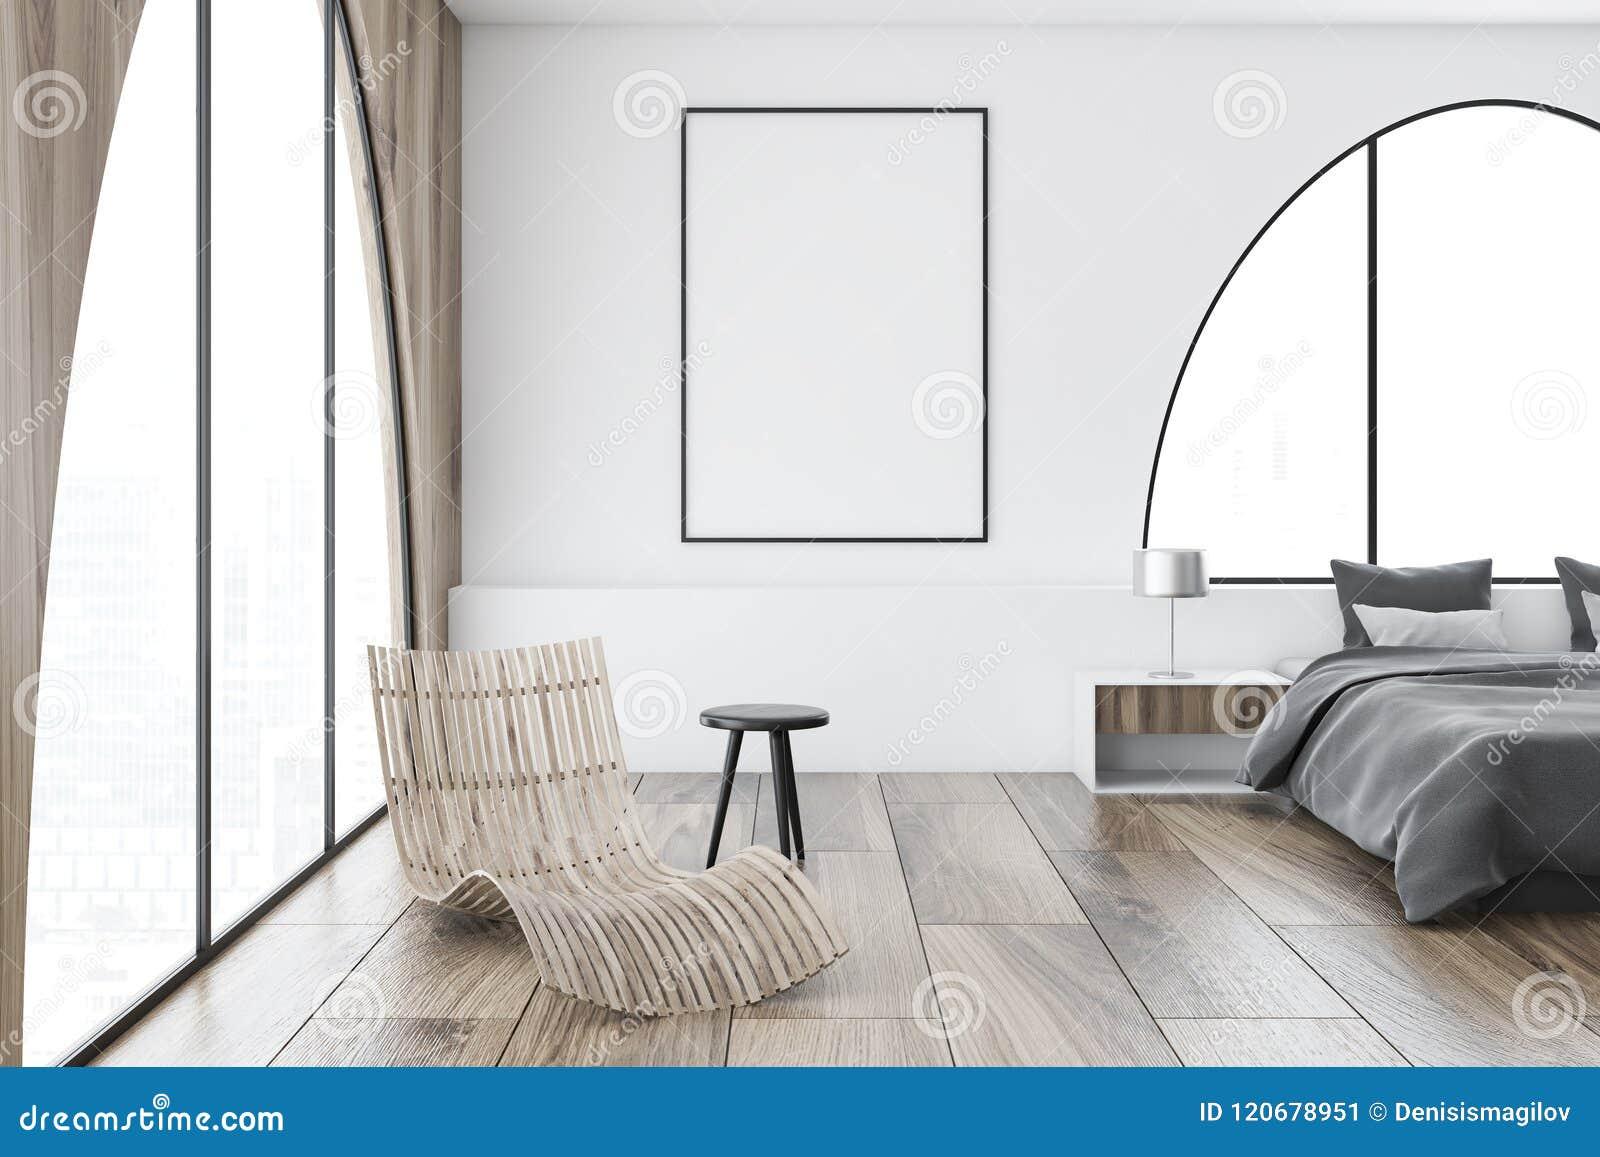 Witte overspannen vensters hoofdslaapkamer, affiche